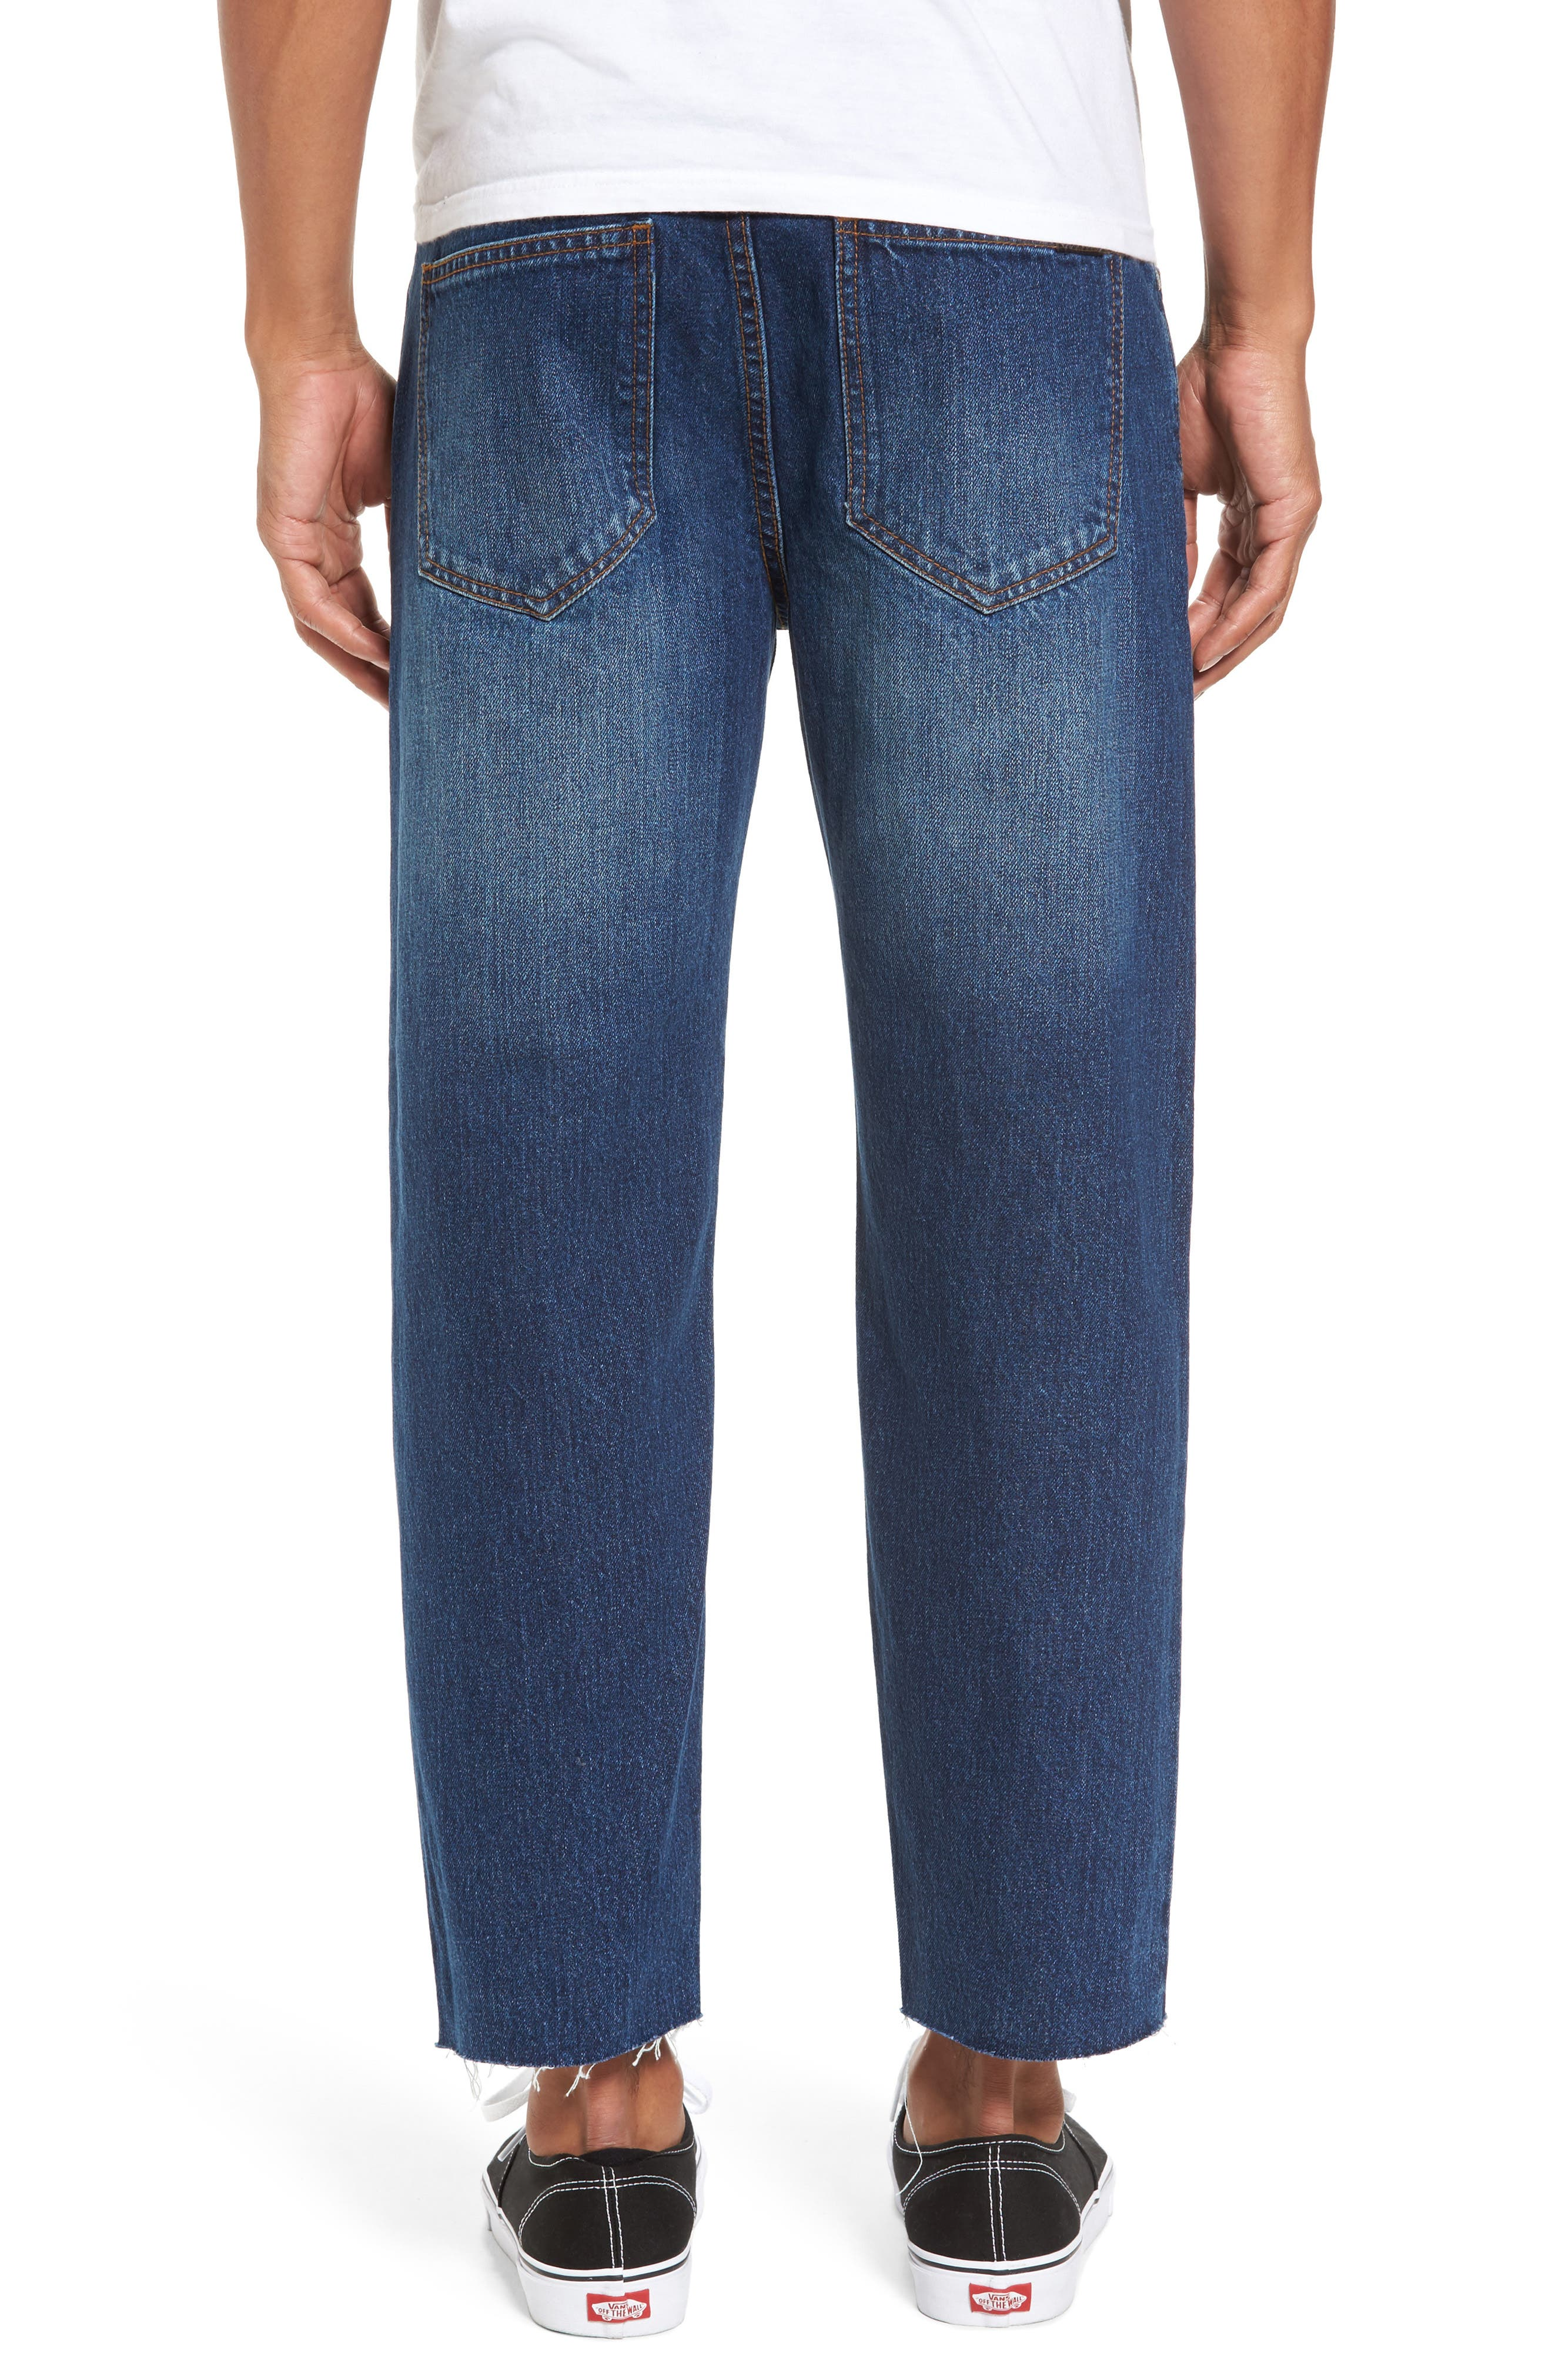 Otis Straight Fit Crop Jeans,                             Alternate thumbnail 2, color,                             Worn Mid Blue Raw Hem